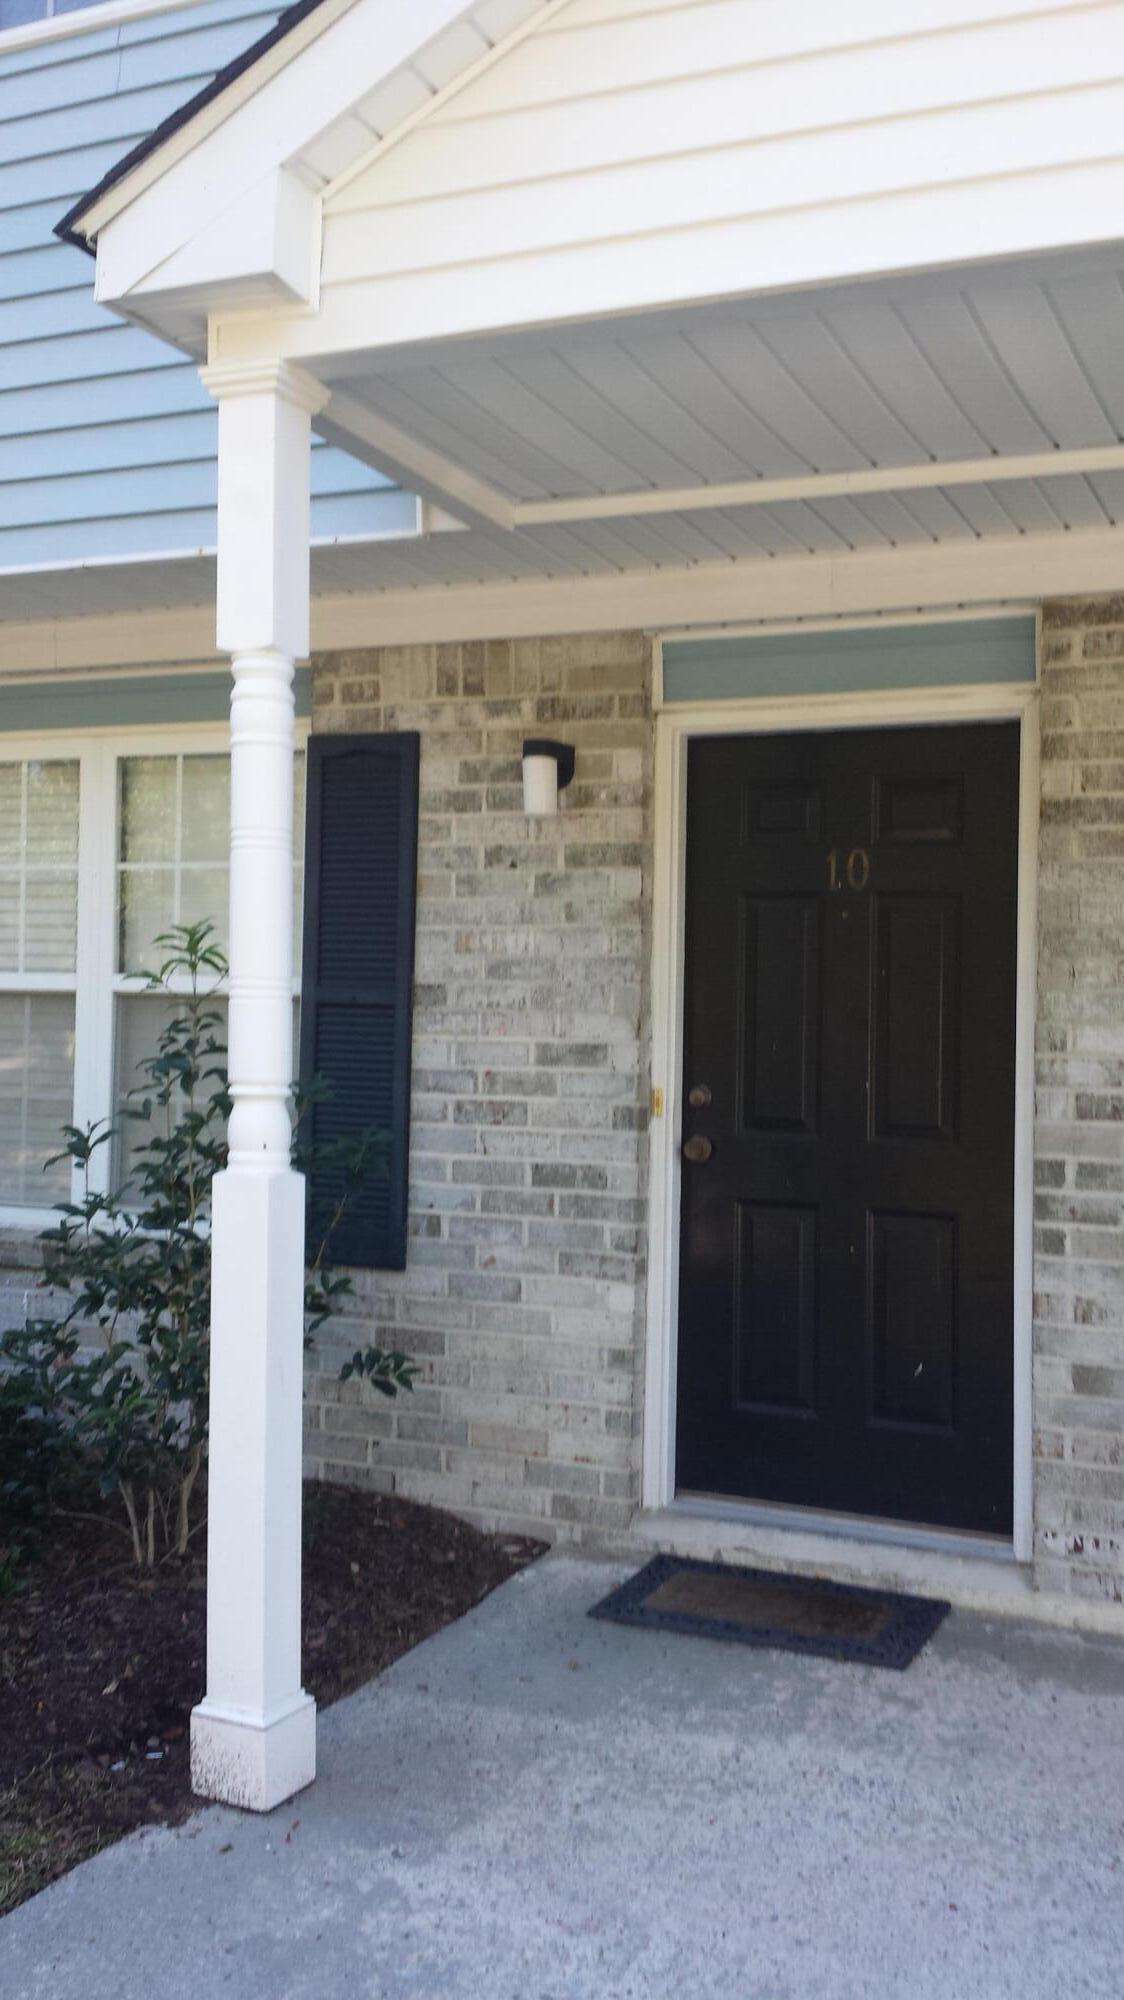 Wildwood Town Homes Homes For Sale - 507 Stinson, Charleston, SC - 8